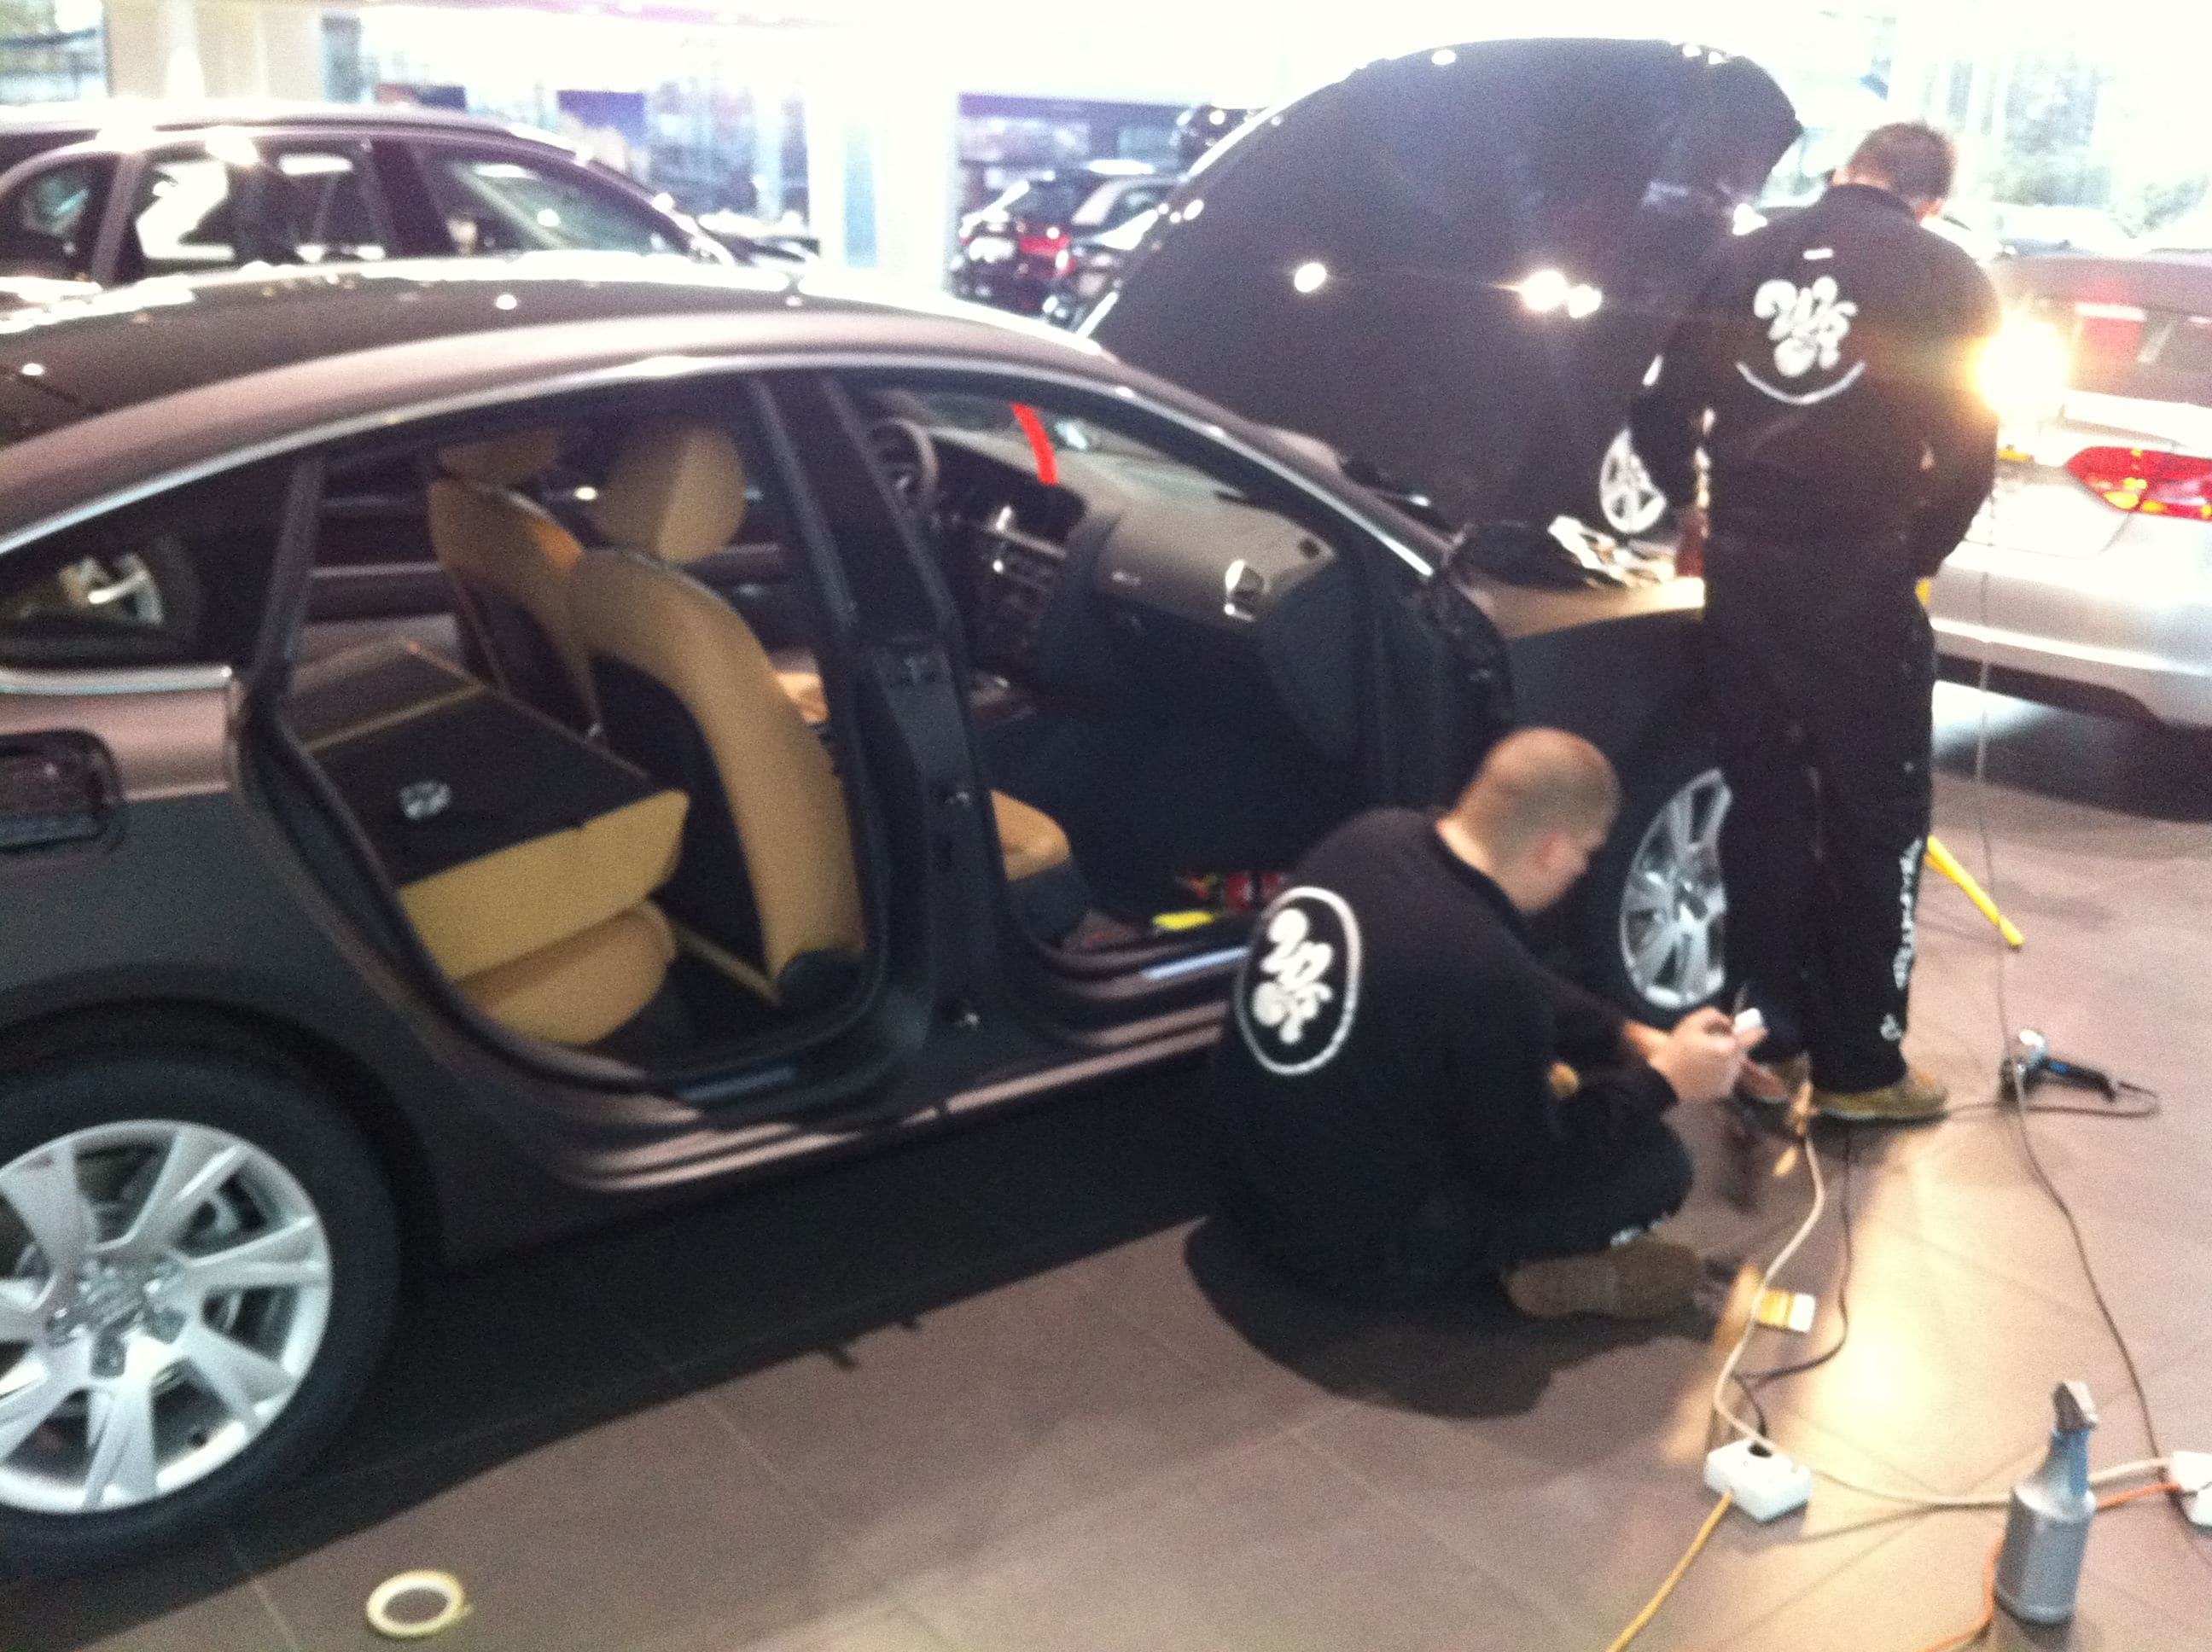 Audi A5 Sportback met Mat Grijze Wrap, Carwrapping door Wrapmyride.nu Foto-nr:4761, ©2021